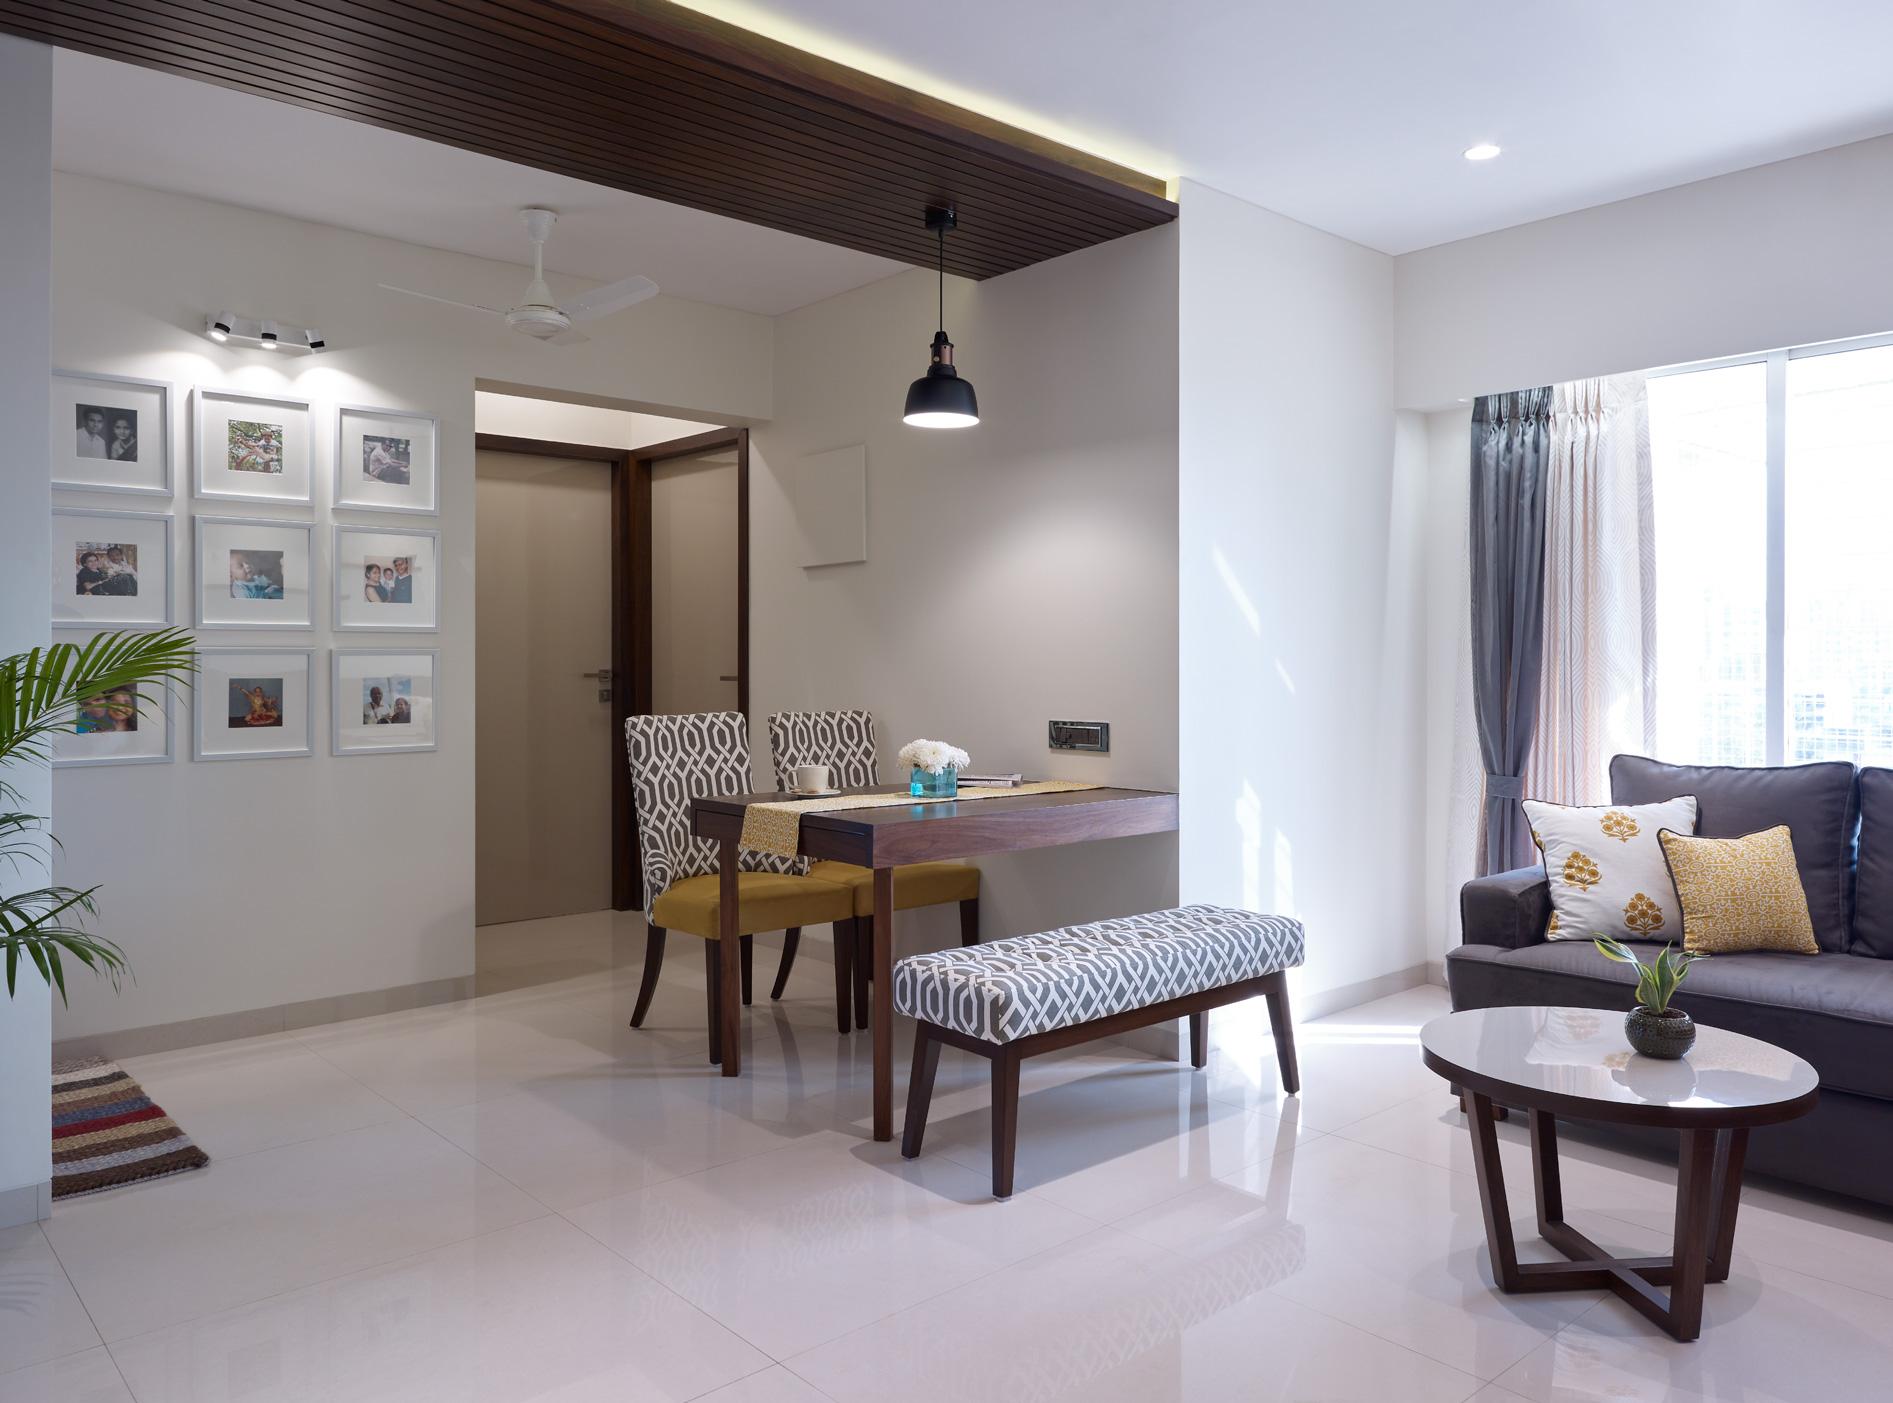 interior design by inscape design, inscape design, home decor, interior design, decor